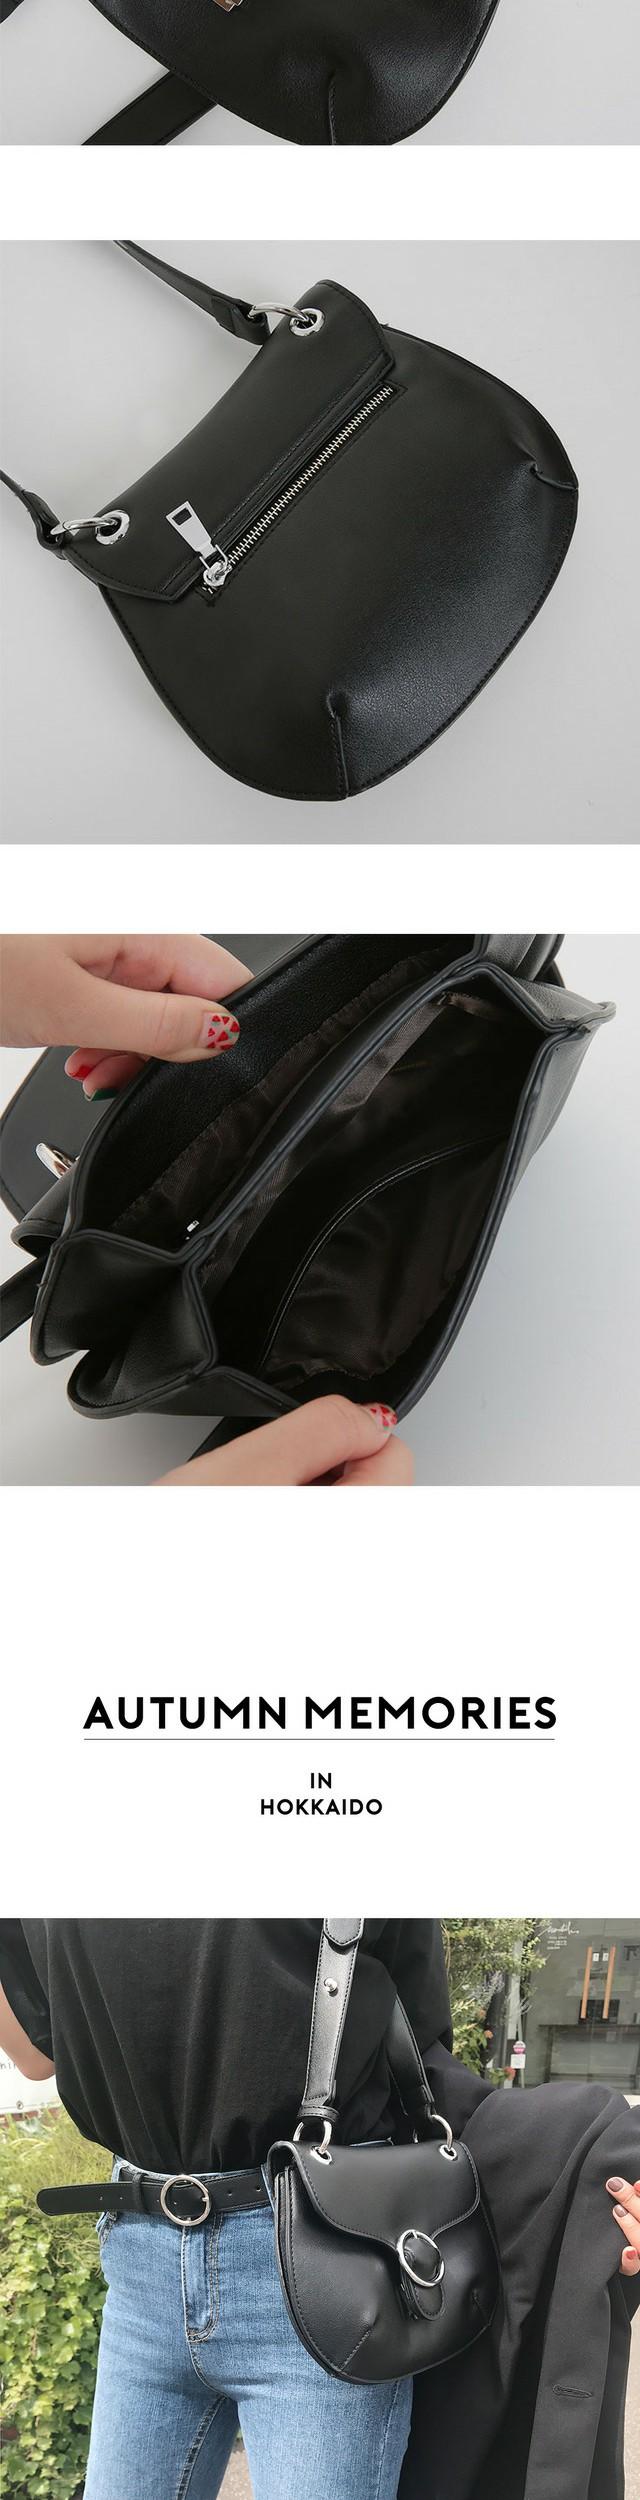 "MA-Clip ""MY ADORABLE BAG"" Mini Cross Bag"